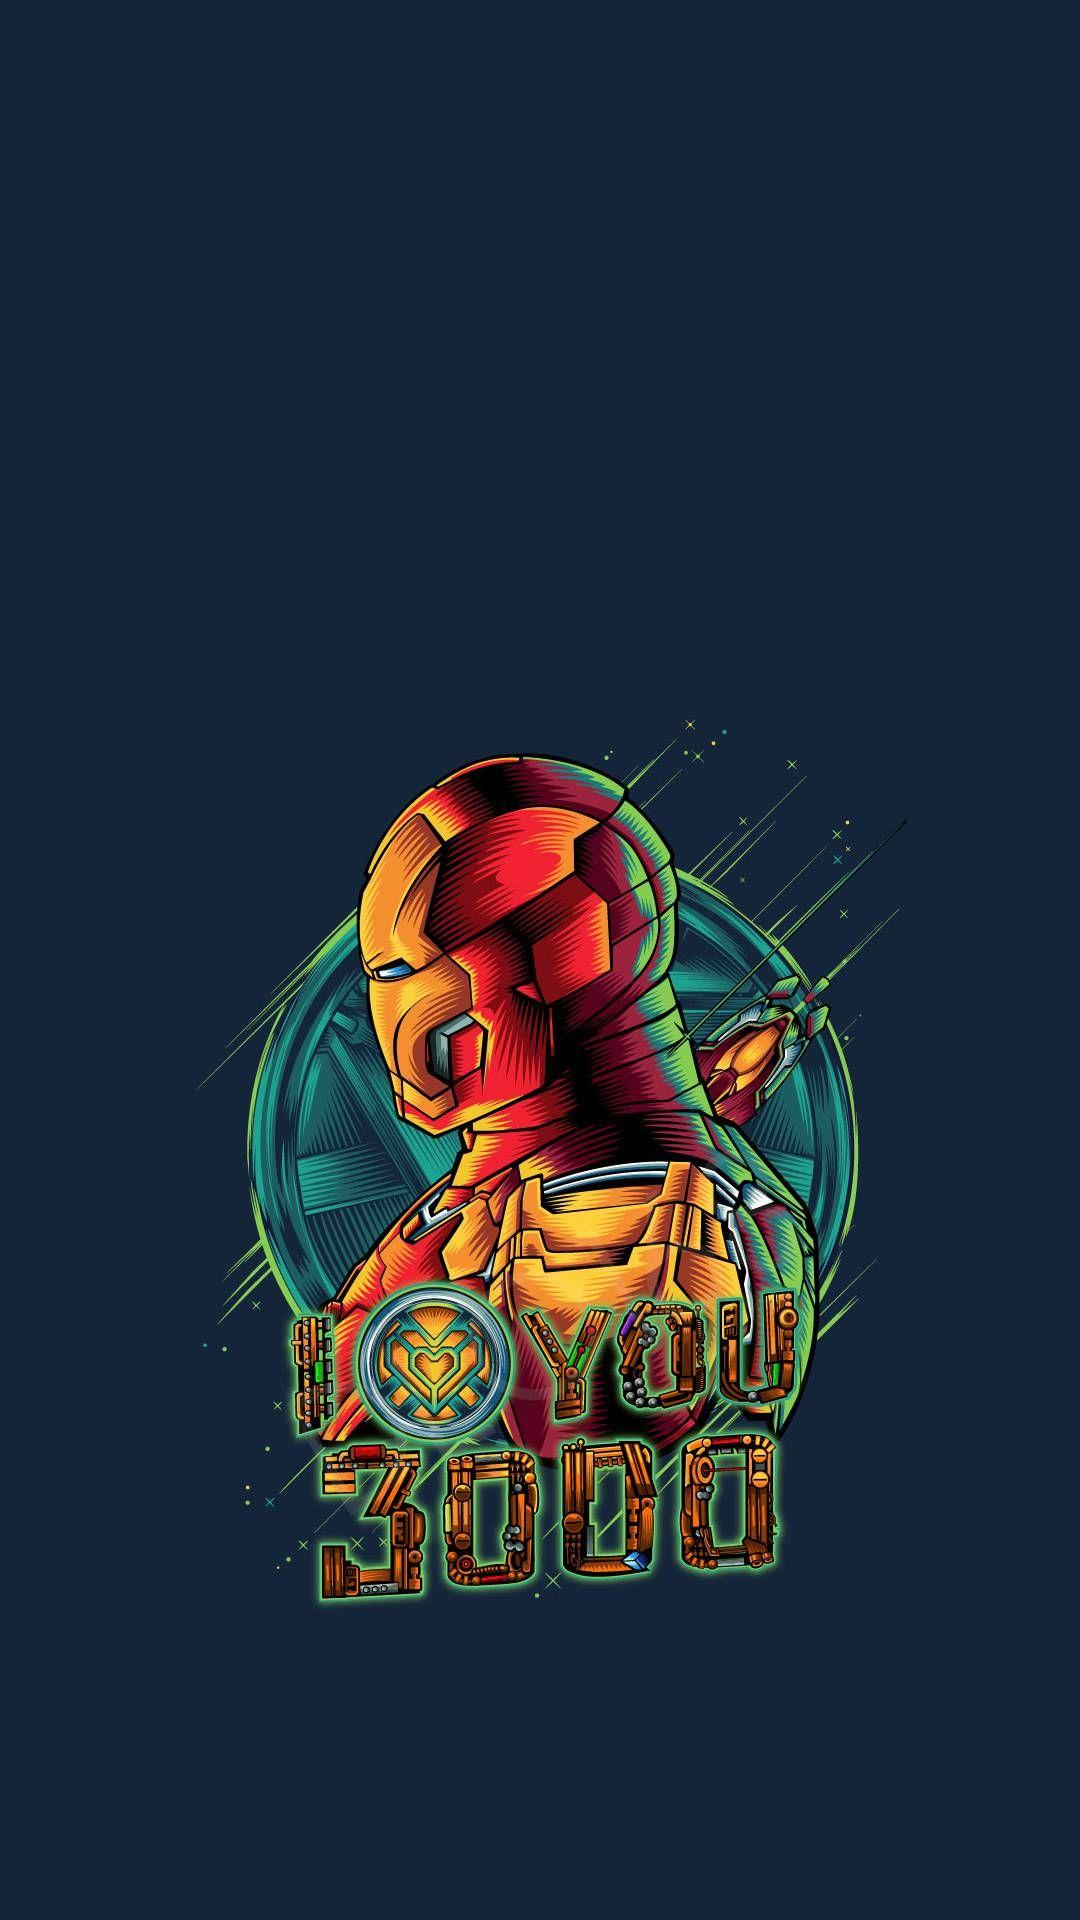 Iron Man Art I Love You 3000 Iphone Wallpaper Iron Man Art Marvel Iron Man Marvel Artwork